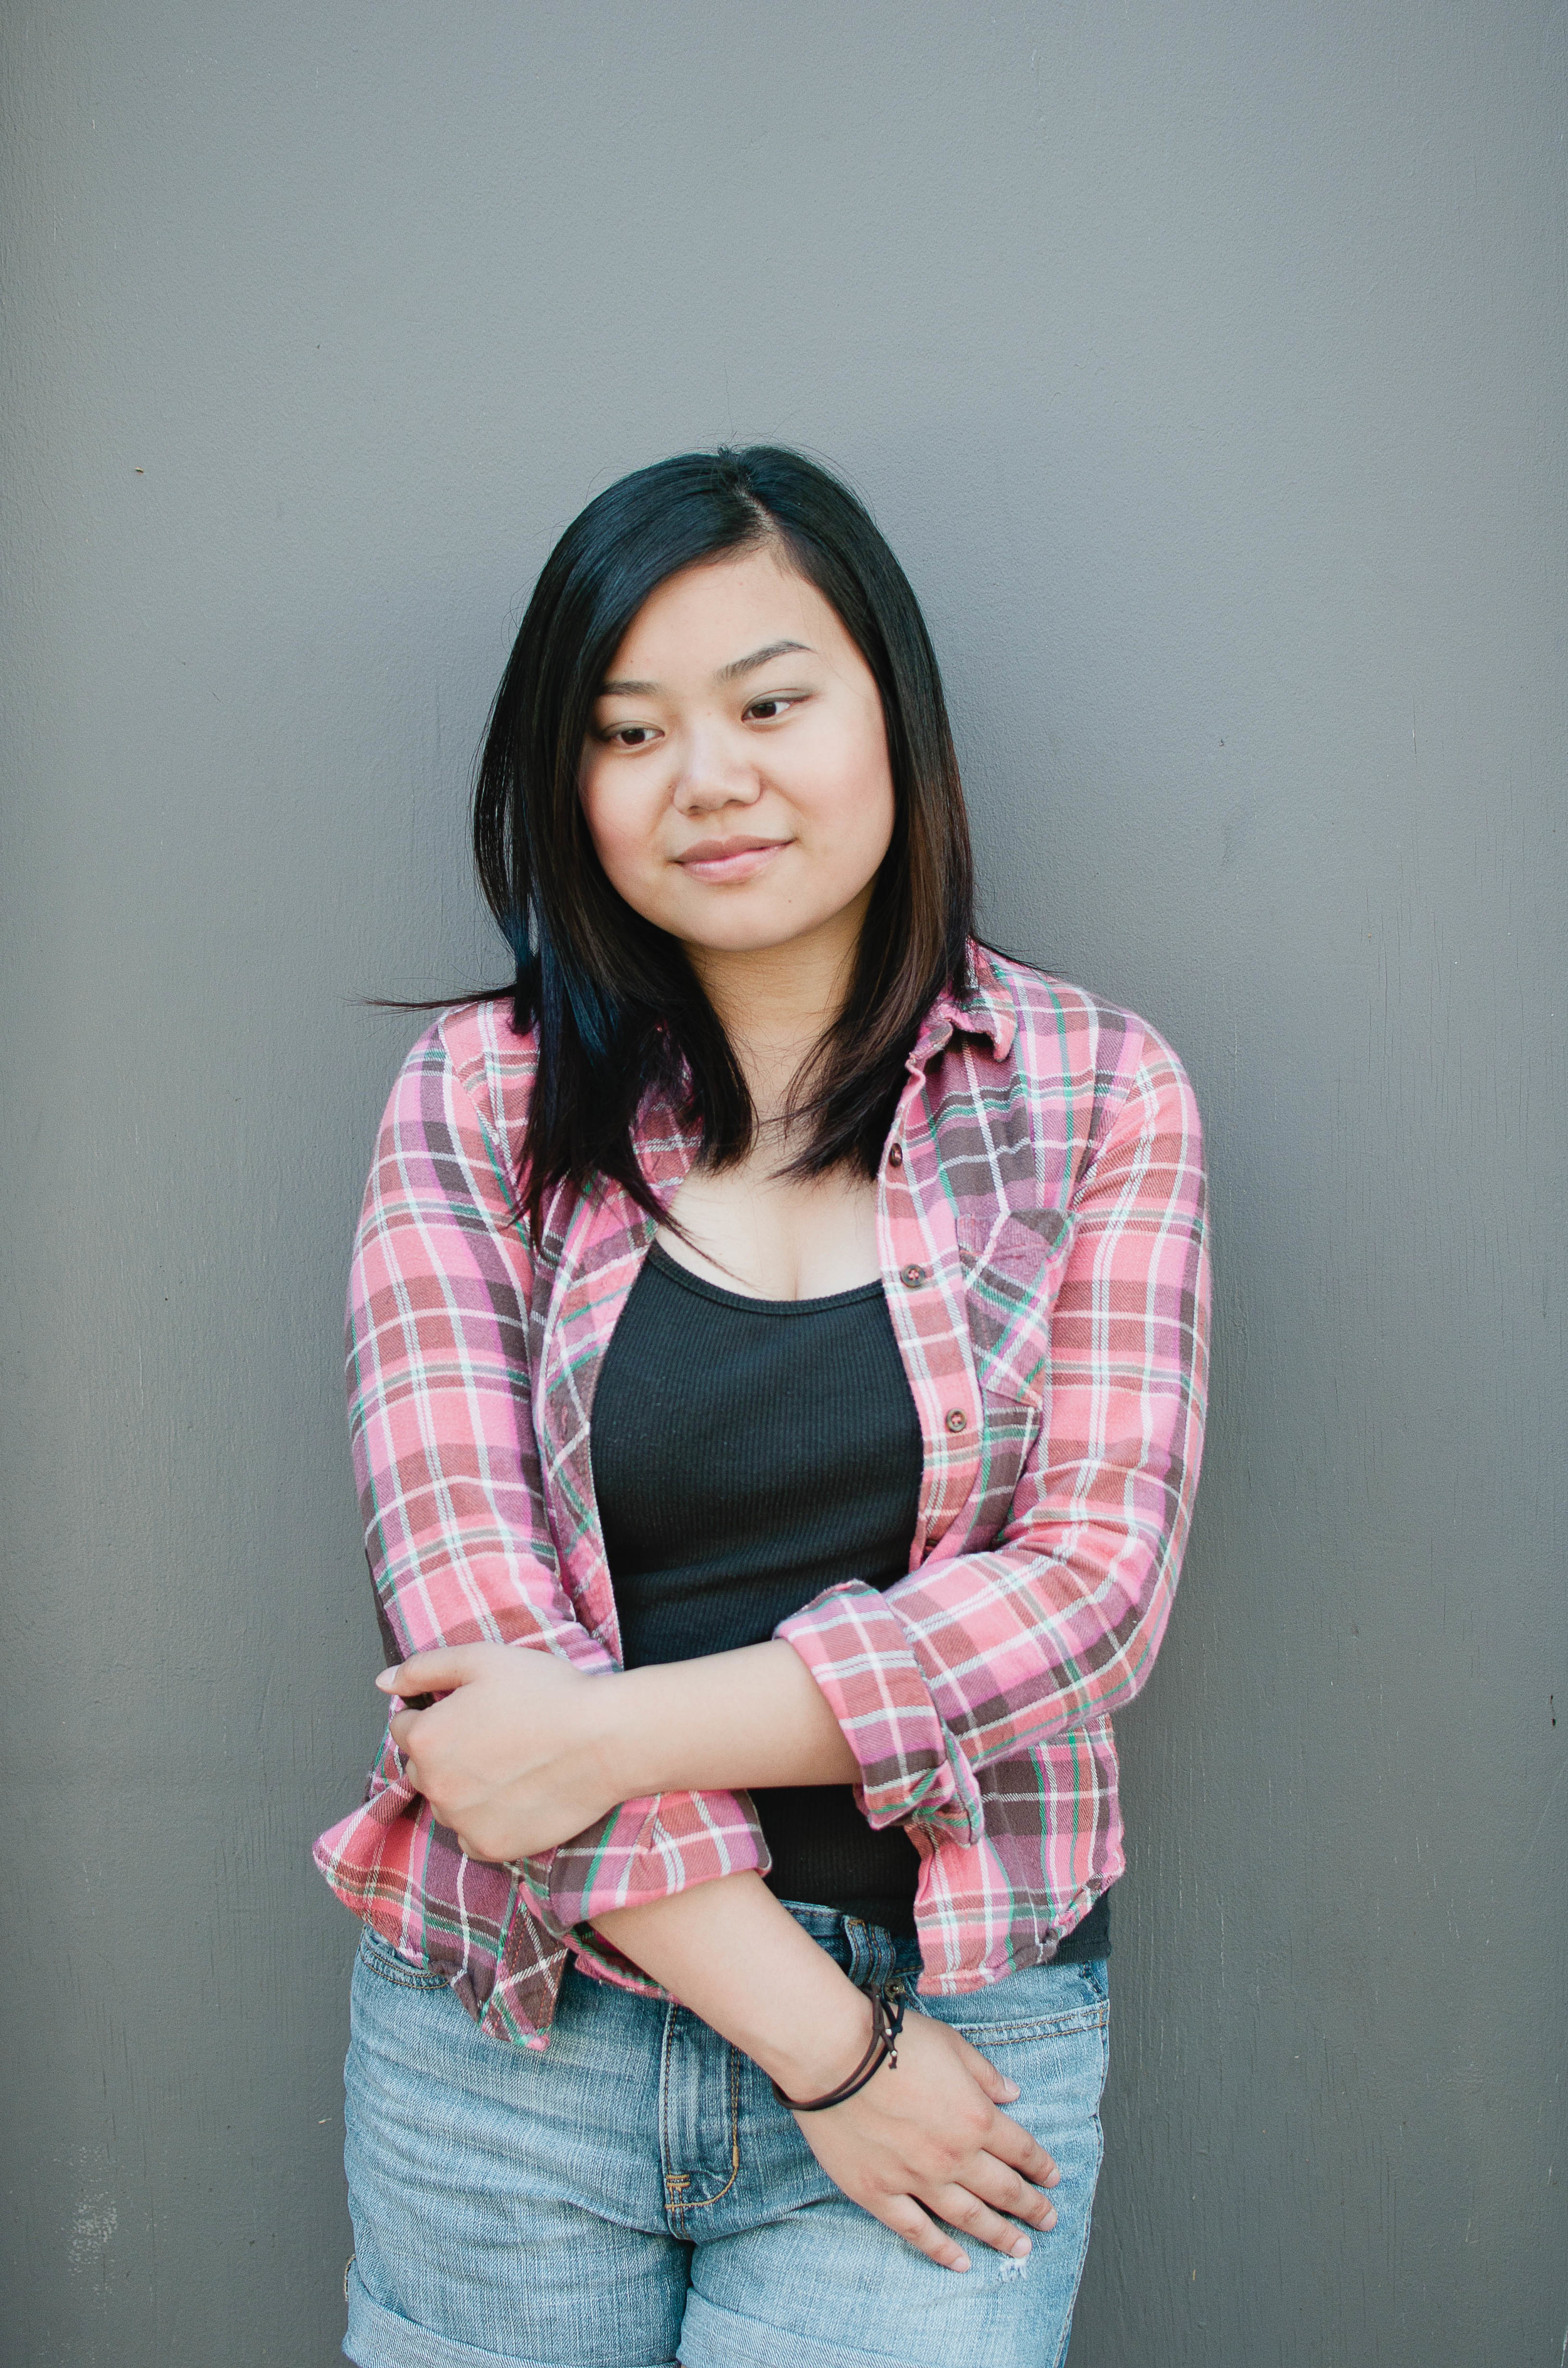 Melissa-Katie Powell Photography - Olympic Village-Portraits-Vancouver-6.jpg